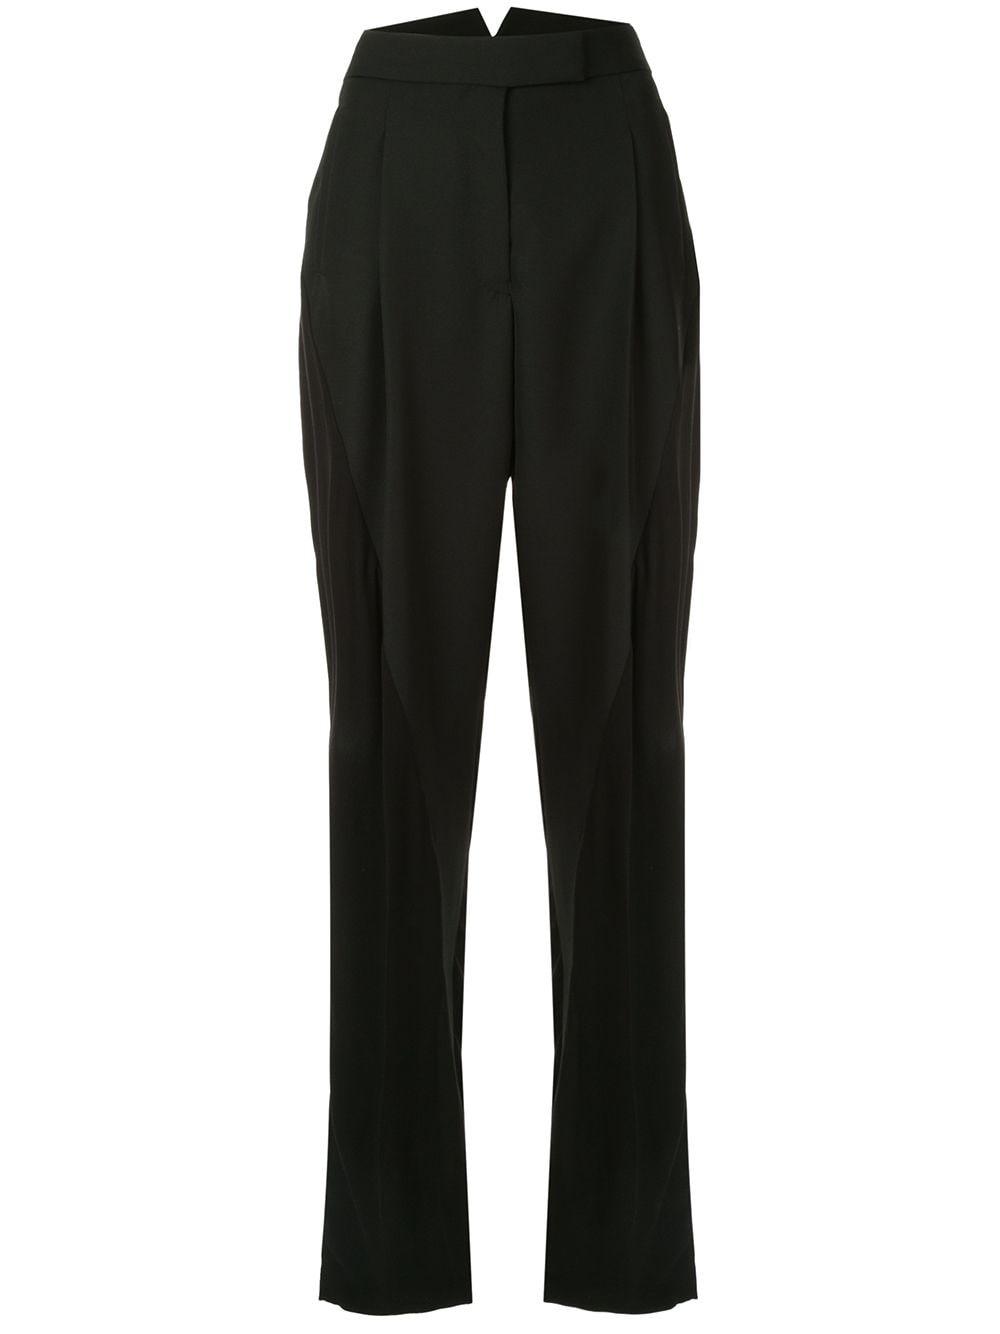 High Waisted Trousers - Sz 36-1